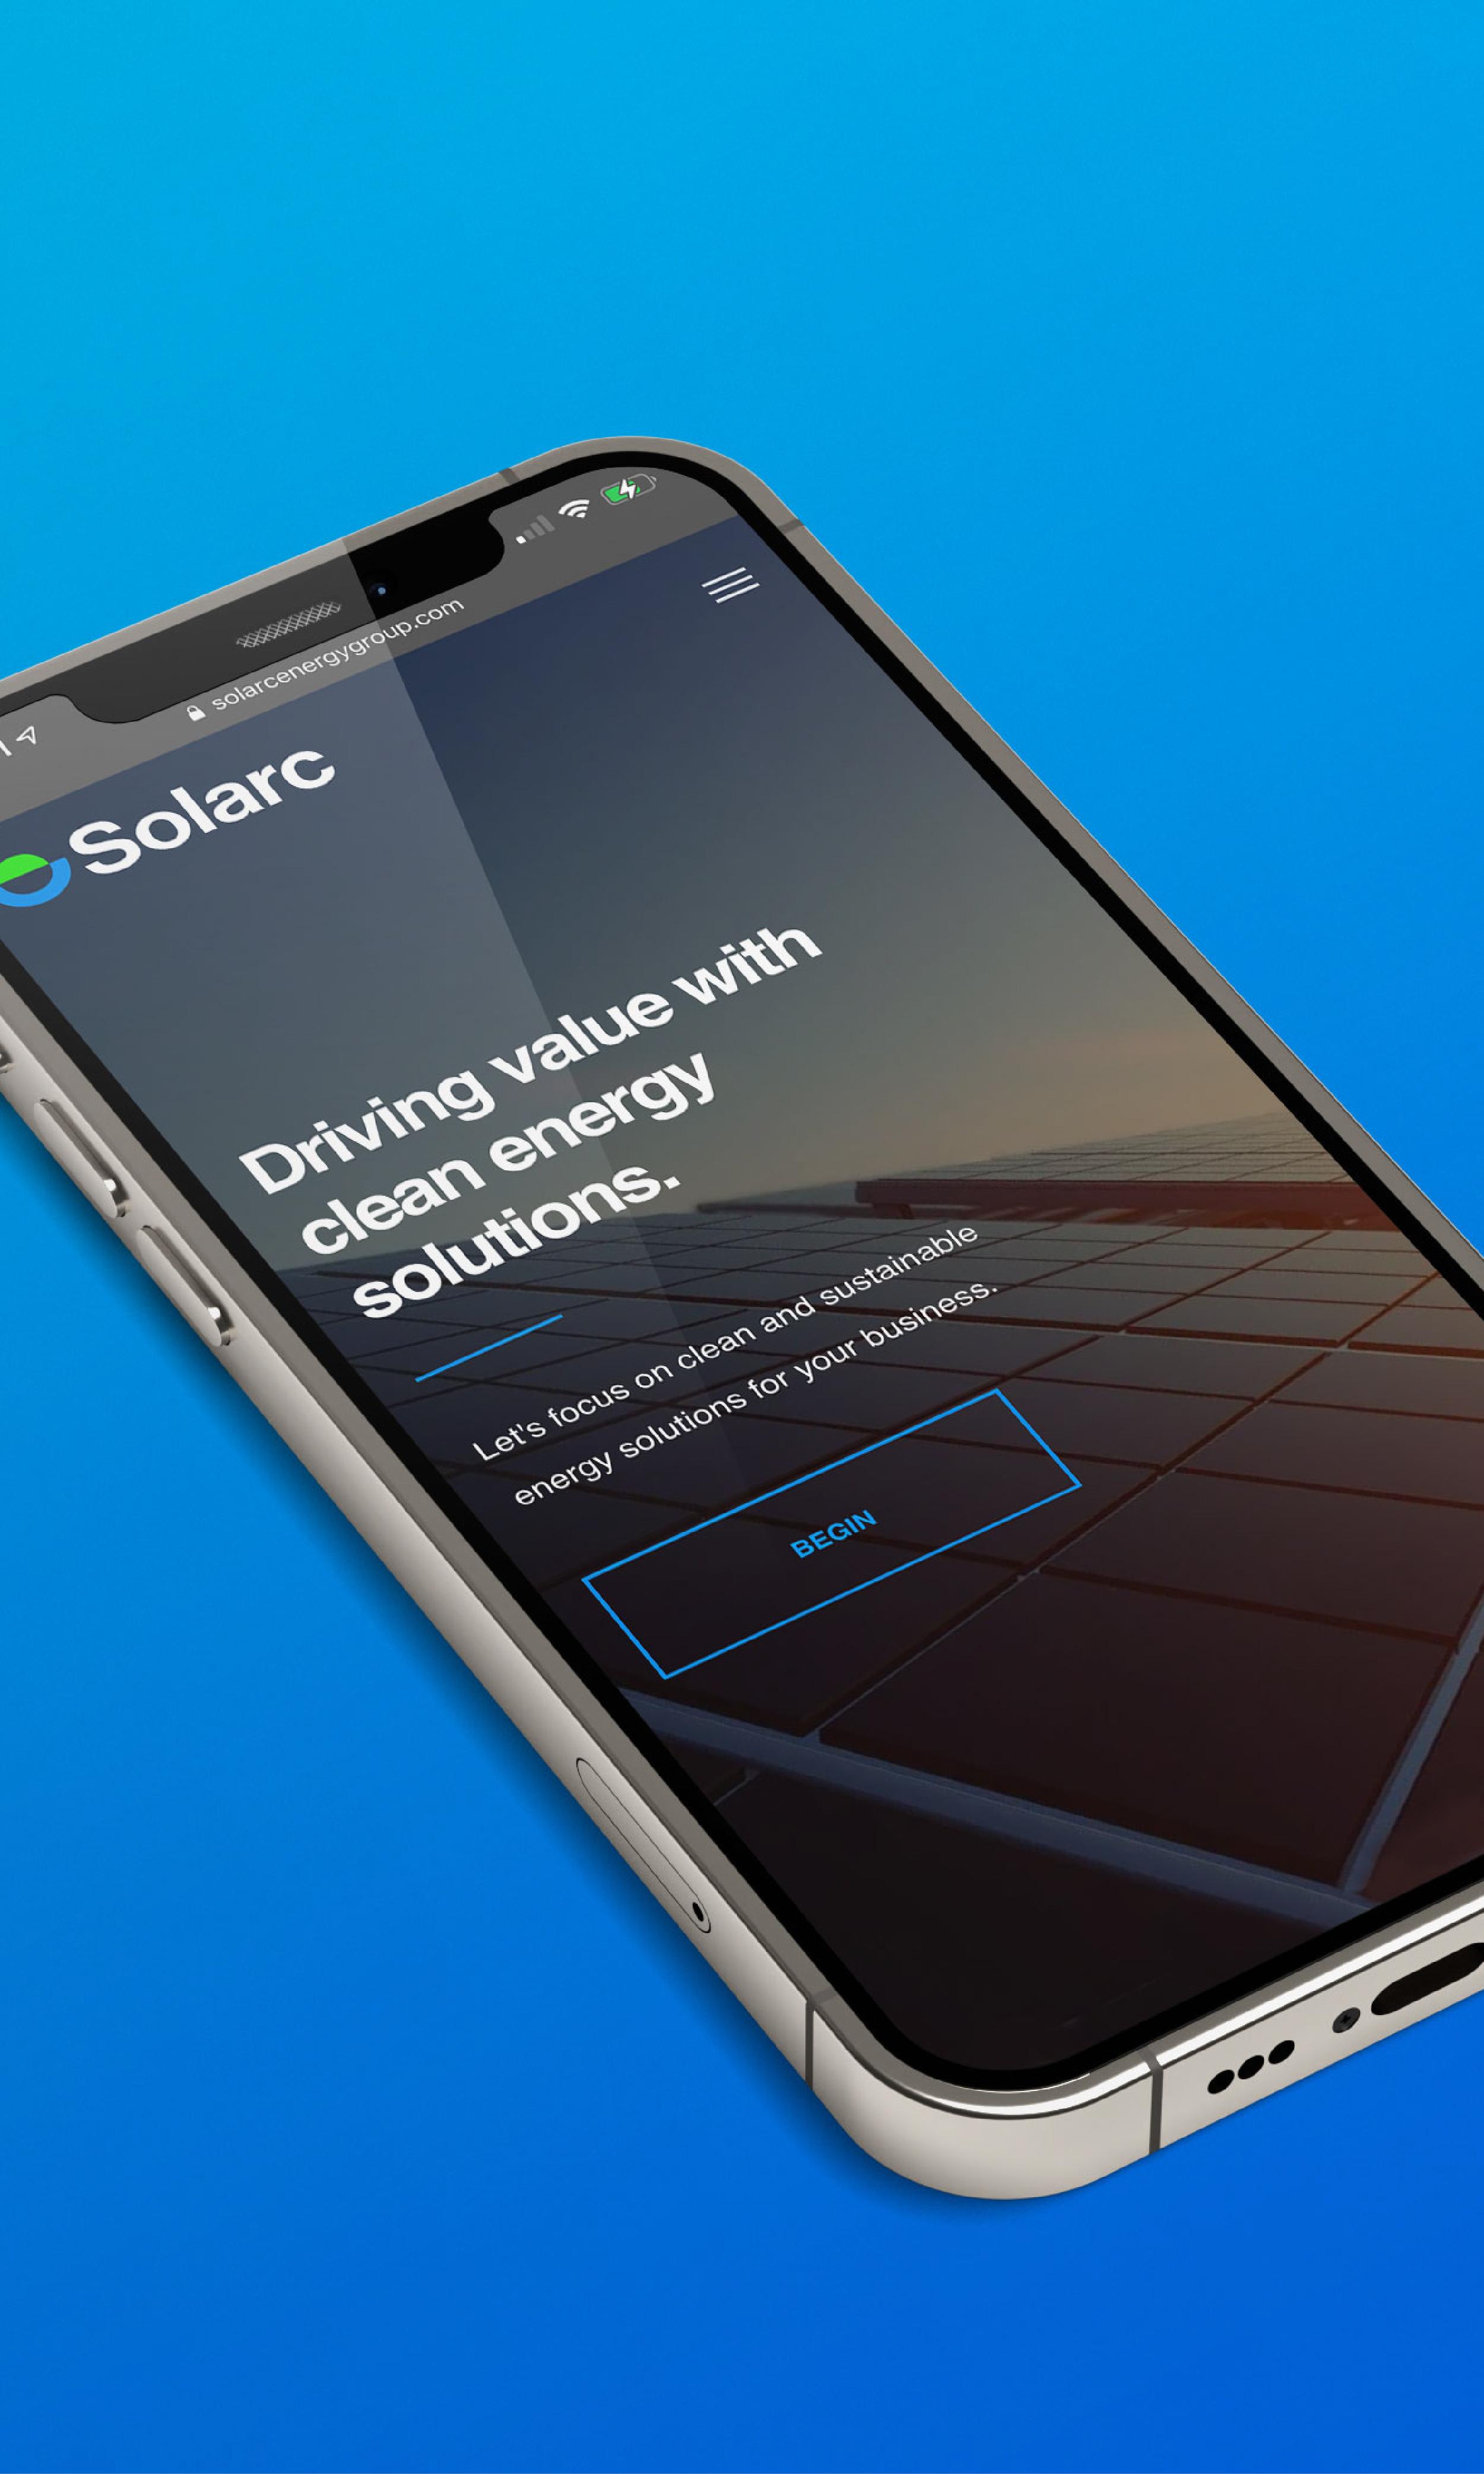 Solarc Case Study